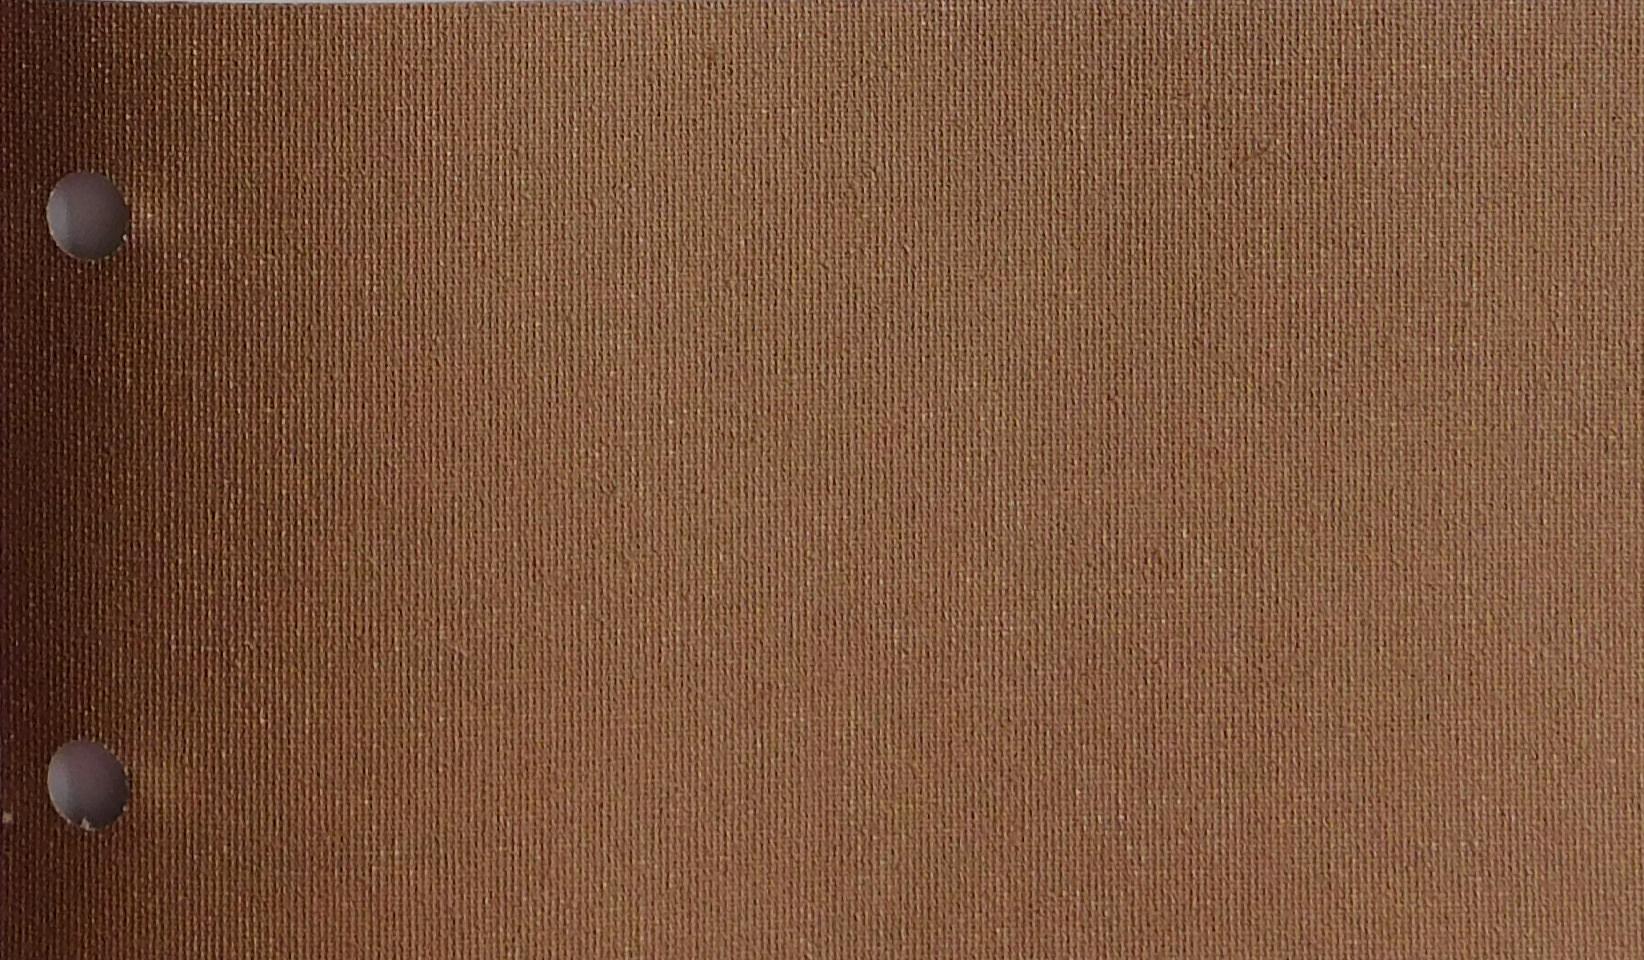 Polaris Hazelnut blind fabric